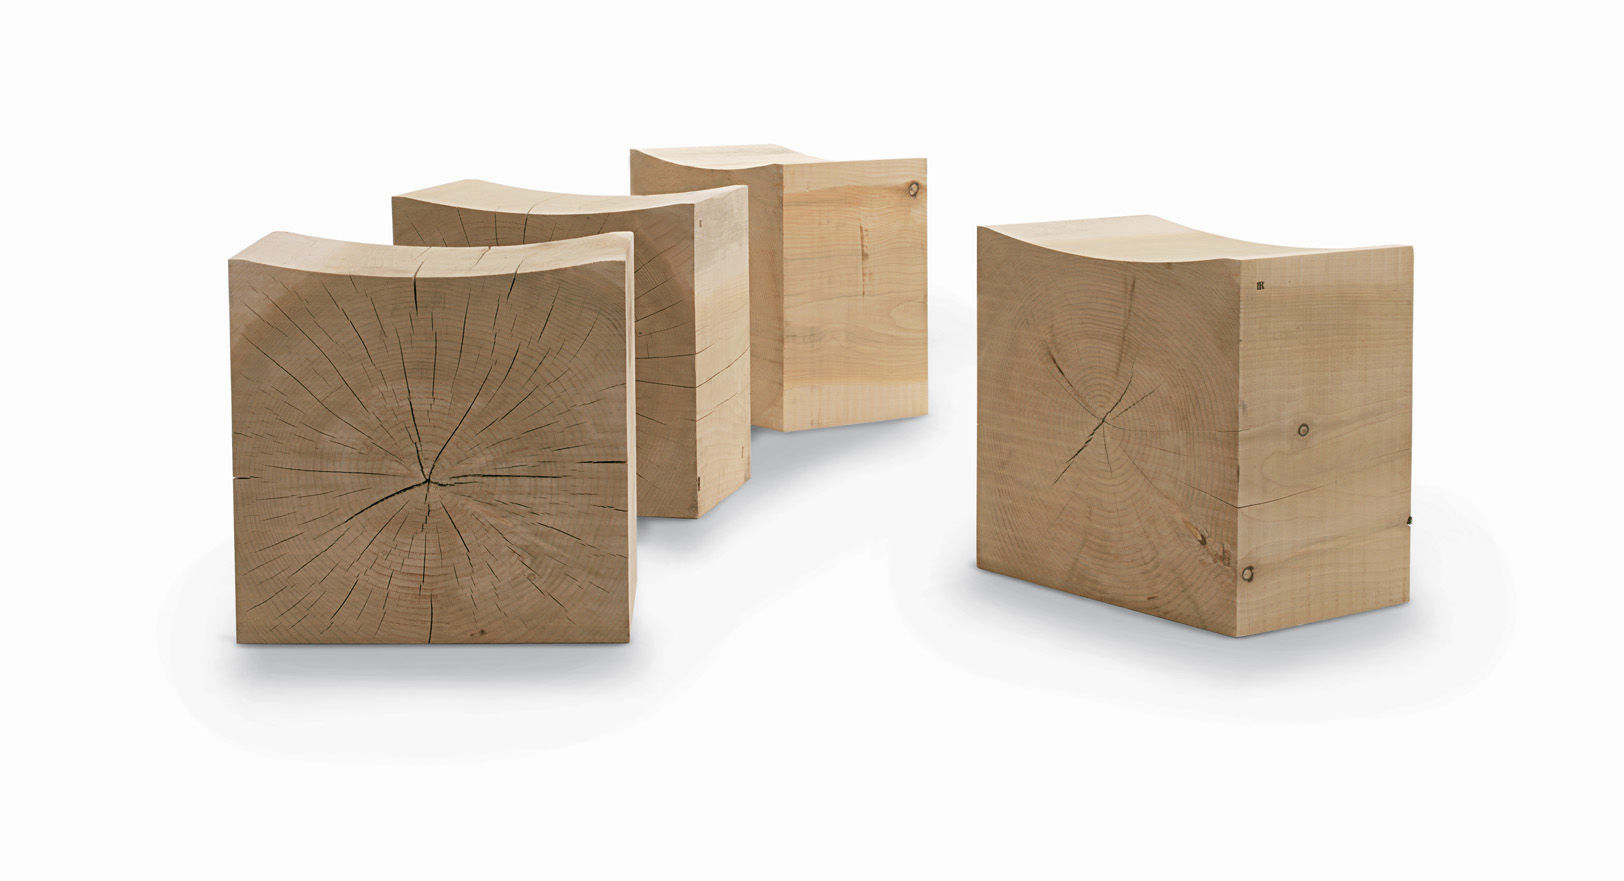 Surprising Contemporary Stool Solid Wood Cedar Garden Unemploymentrelief Wooden Chair Designs For Living Room Unemploymentrelieforg